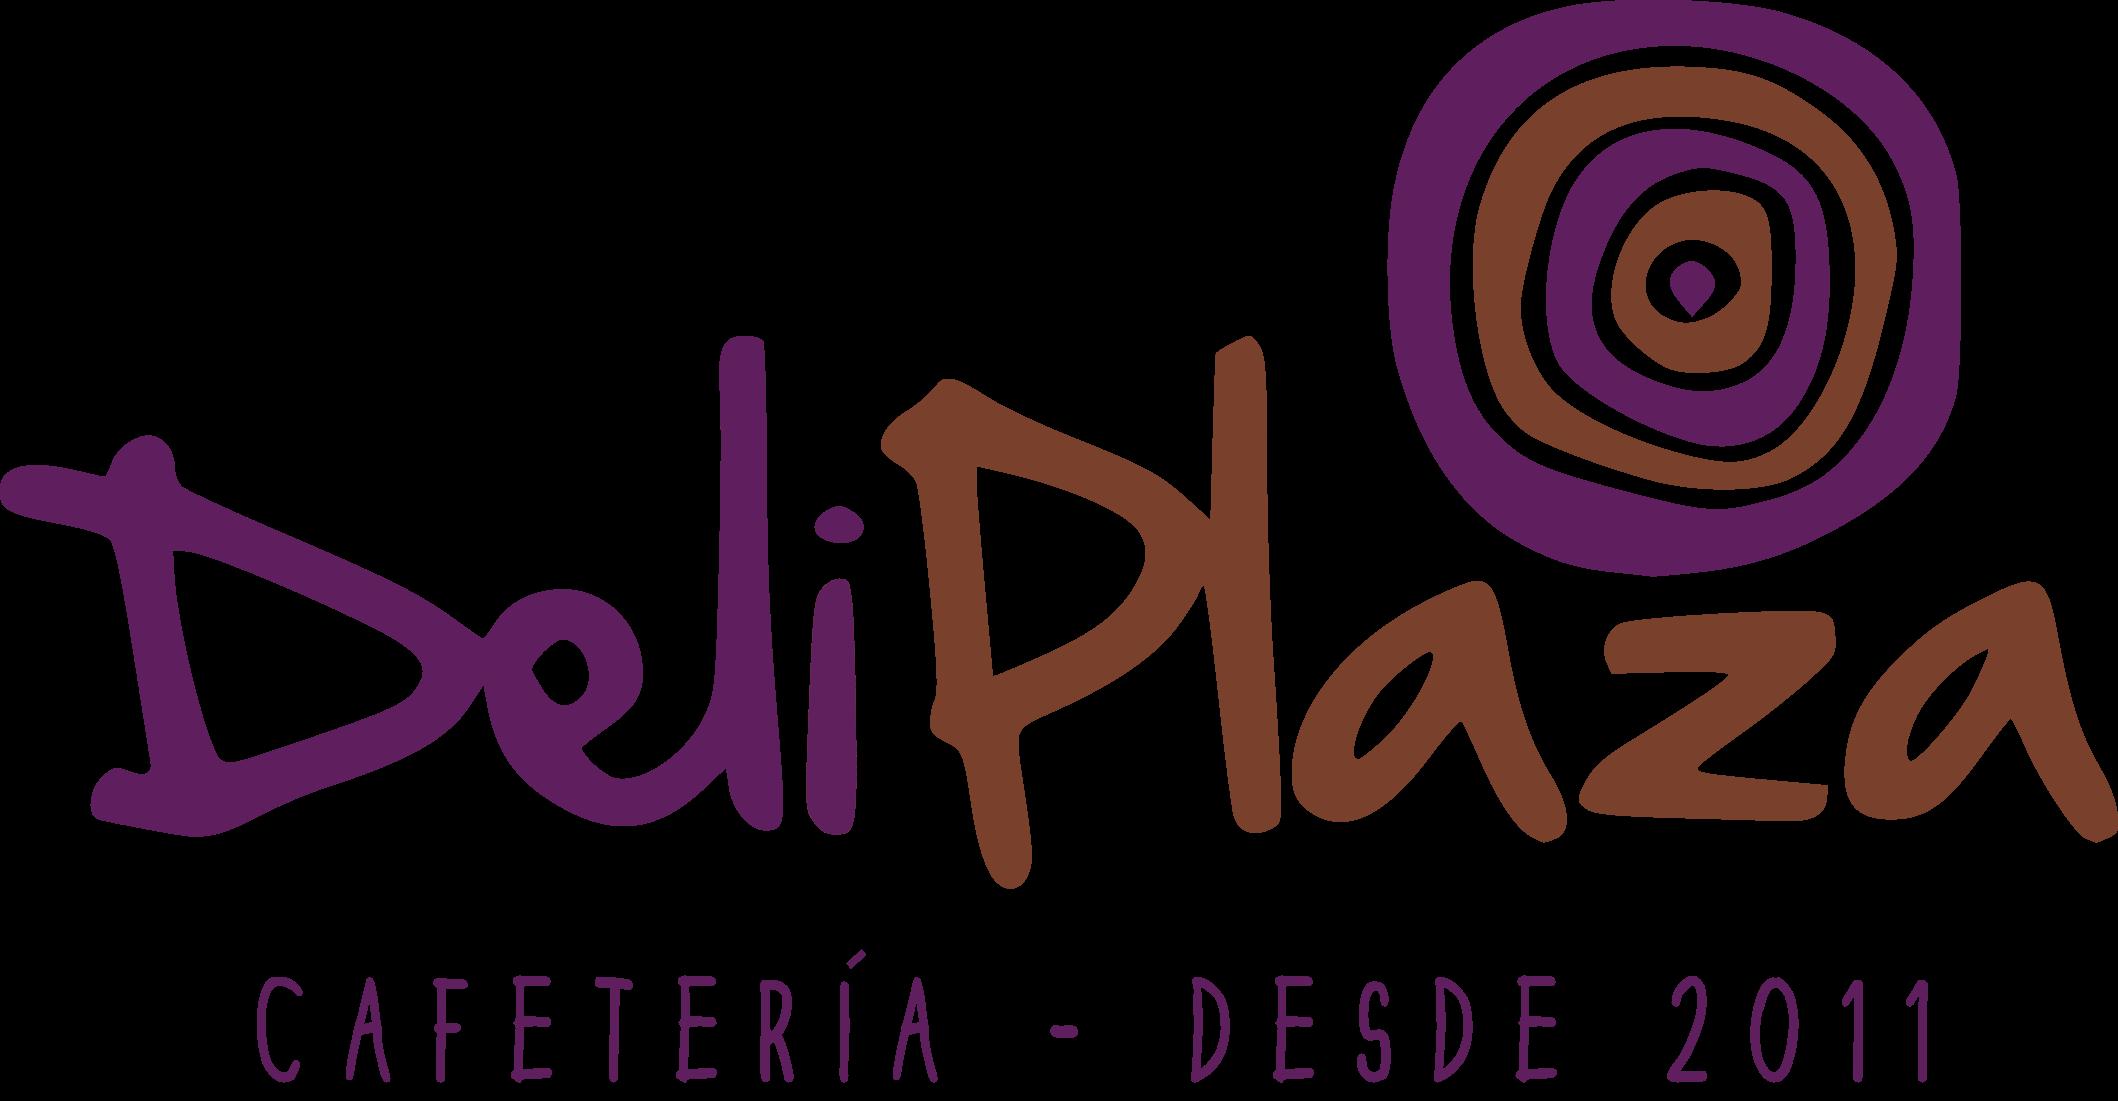 Café Deliplaza-